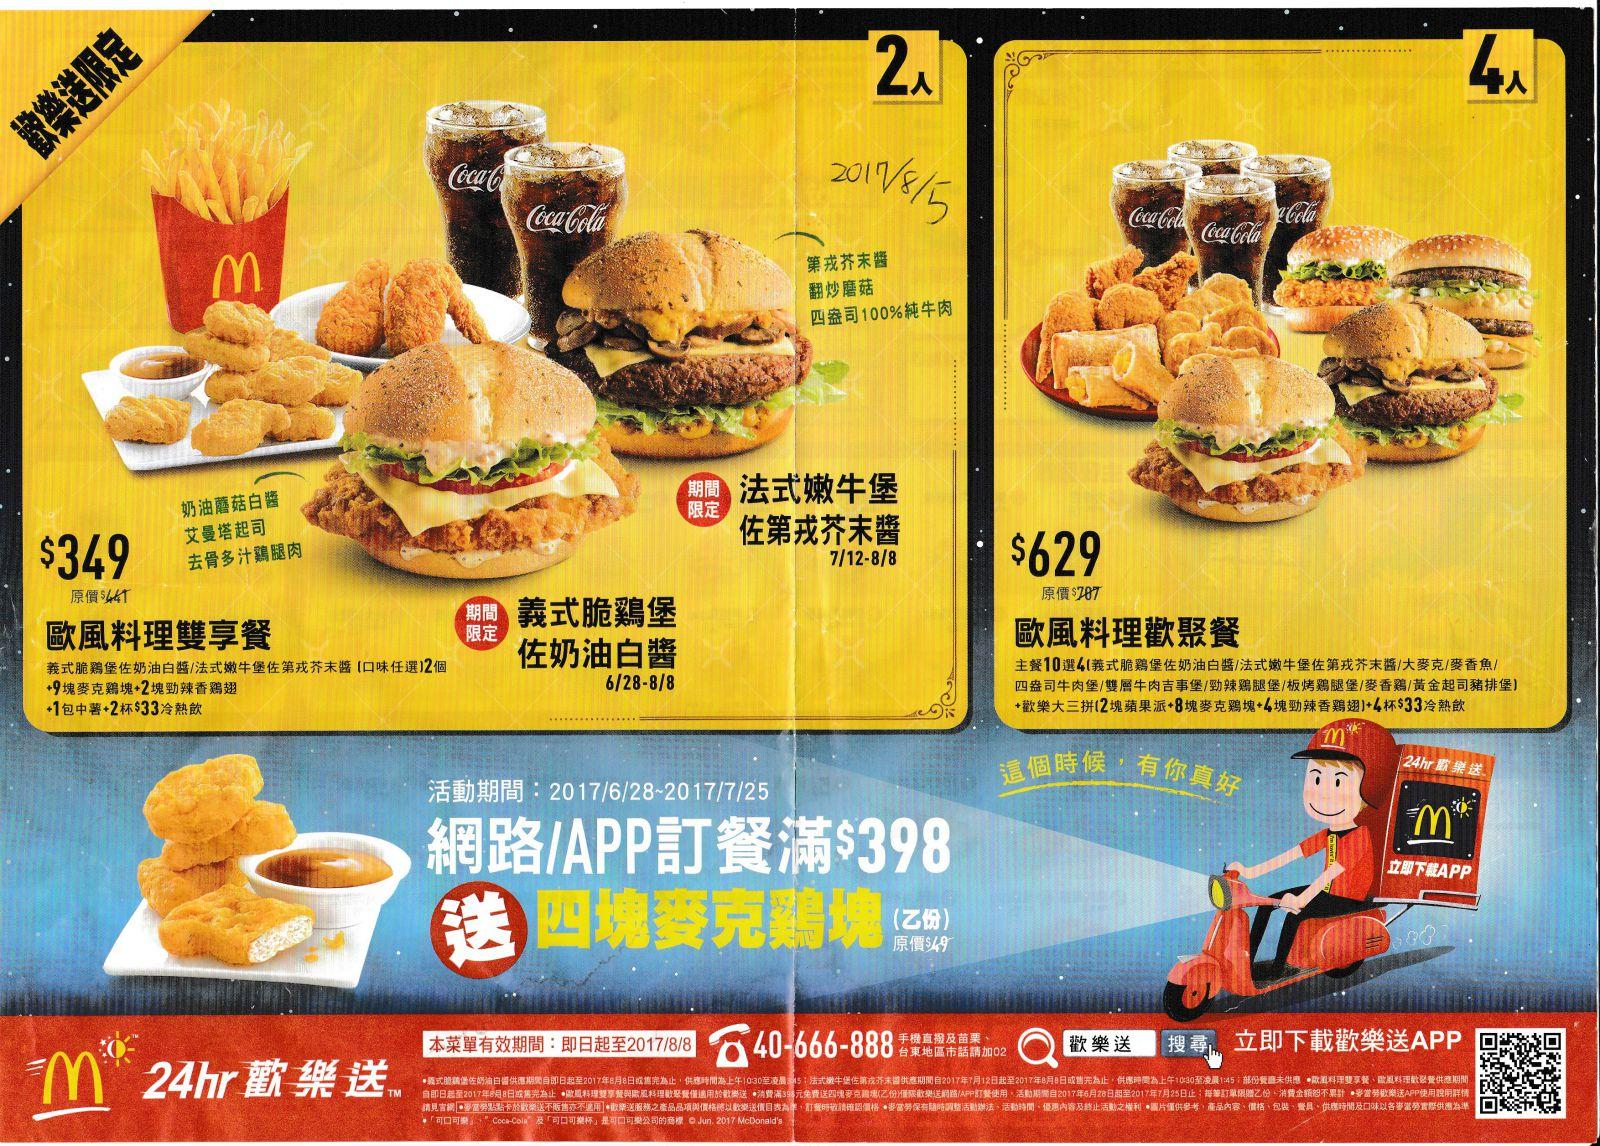 [DM][菜單] 我的麥當勞DM蒐集區 - 臺中阿任的Joomla3網站